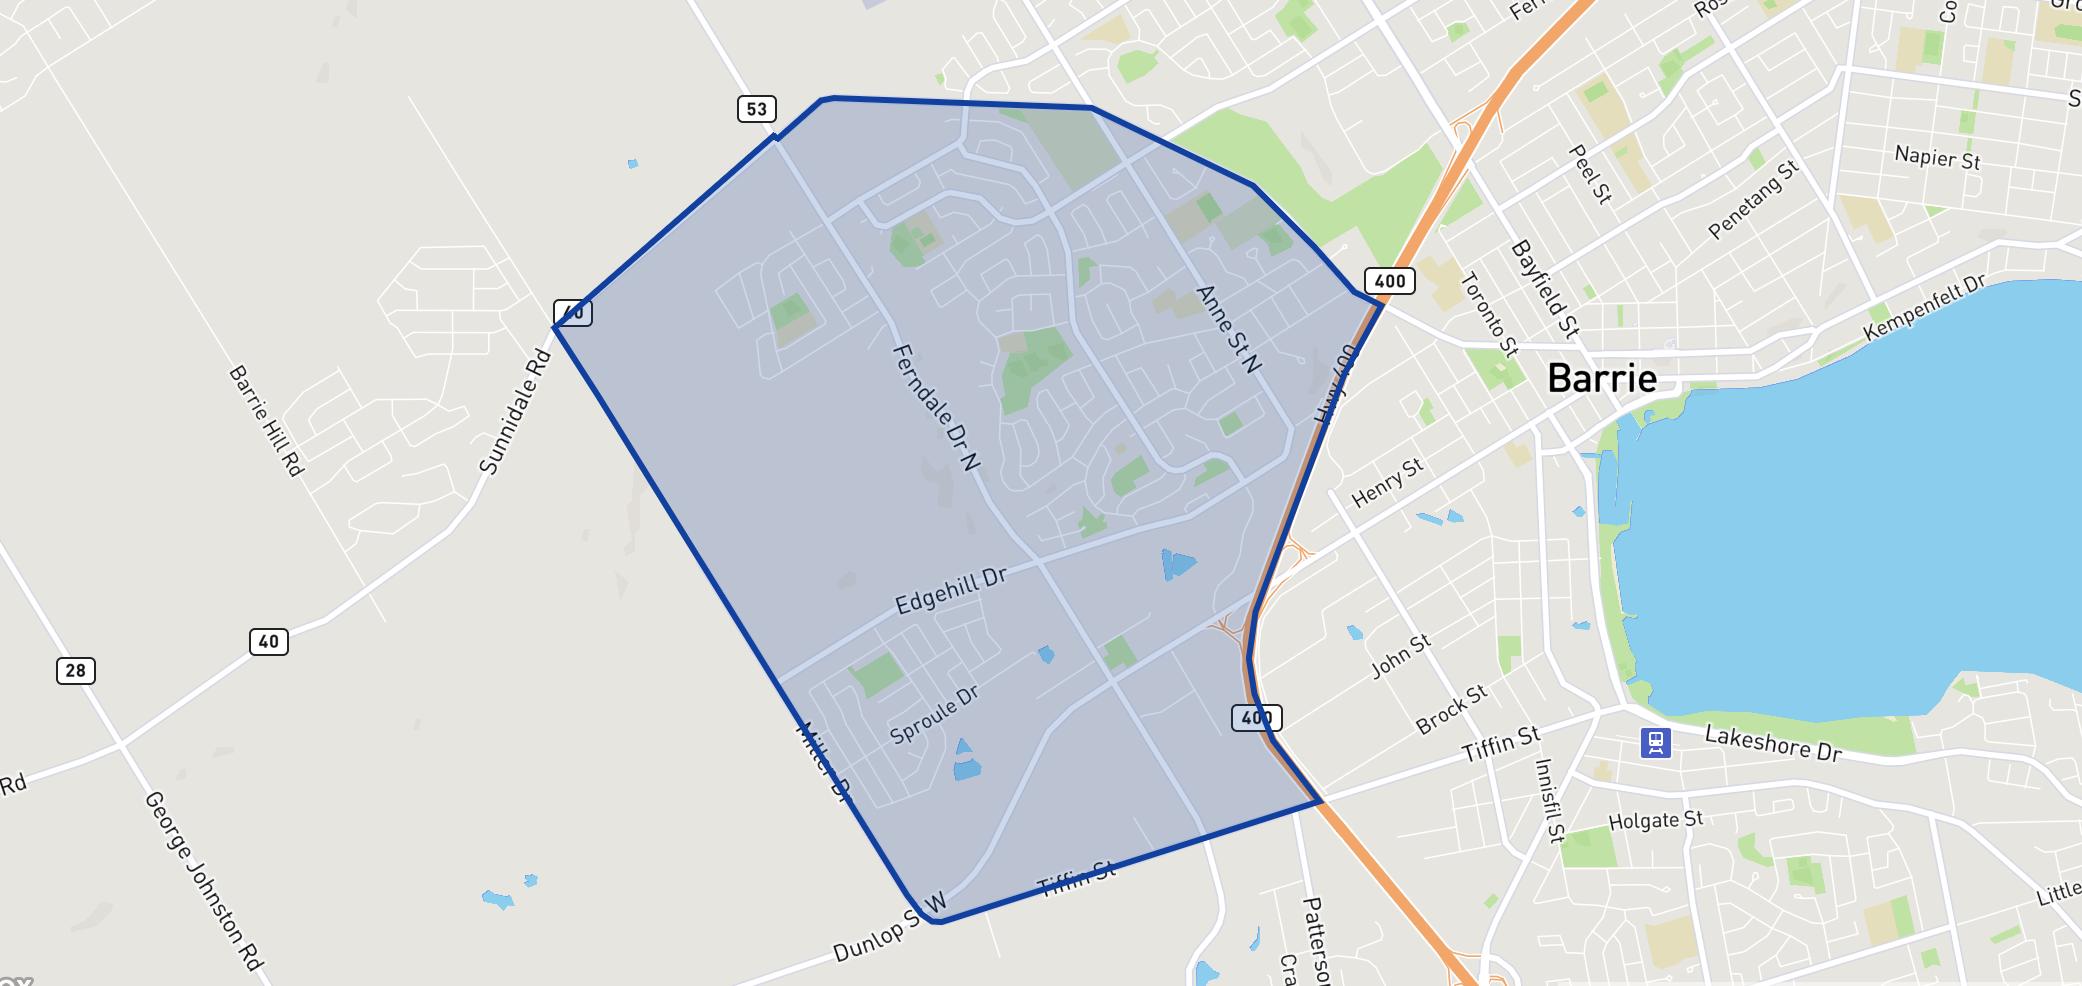 Barrie West neighbourhood borders